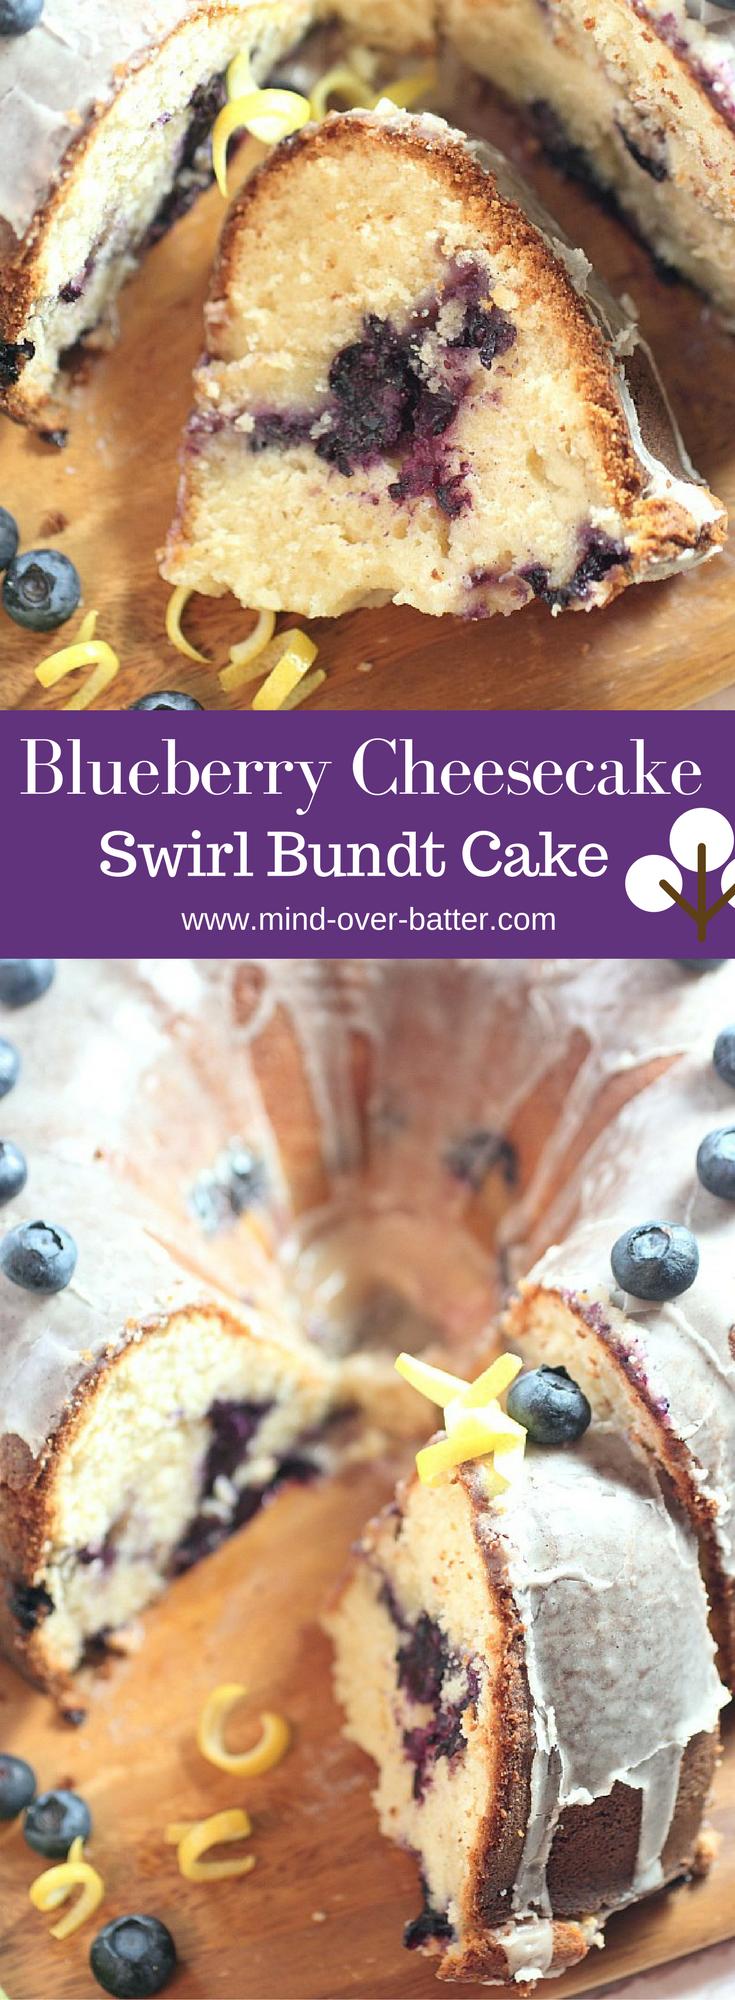 Blueberry Cheesecake Swirl Bundt Cake Www Mind Over Batter Com